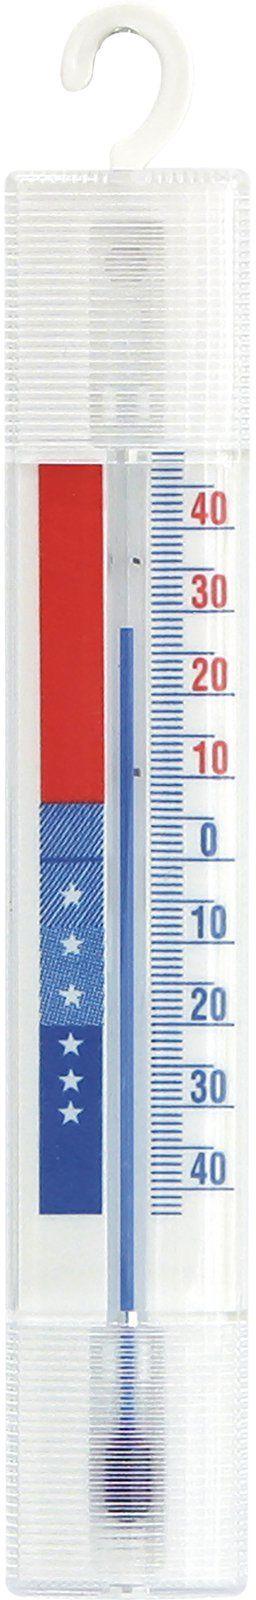 Termometr do lodówek i zamrażarek